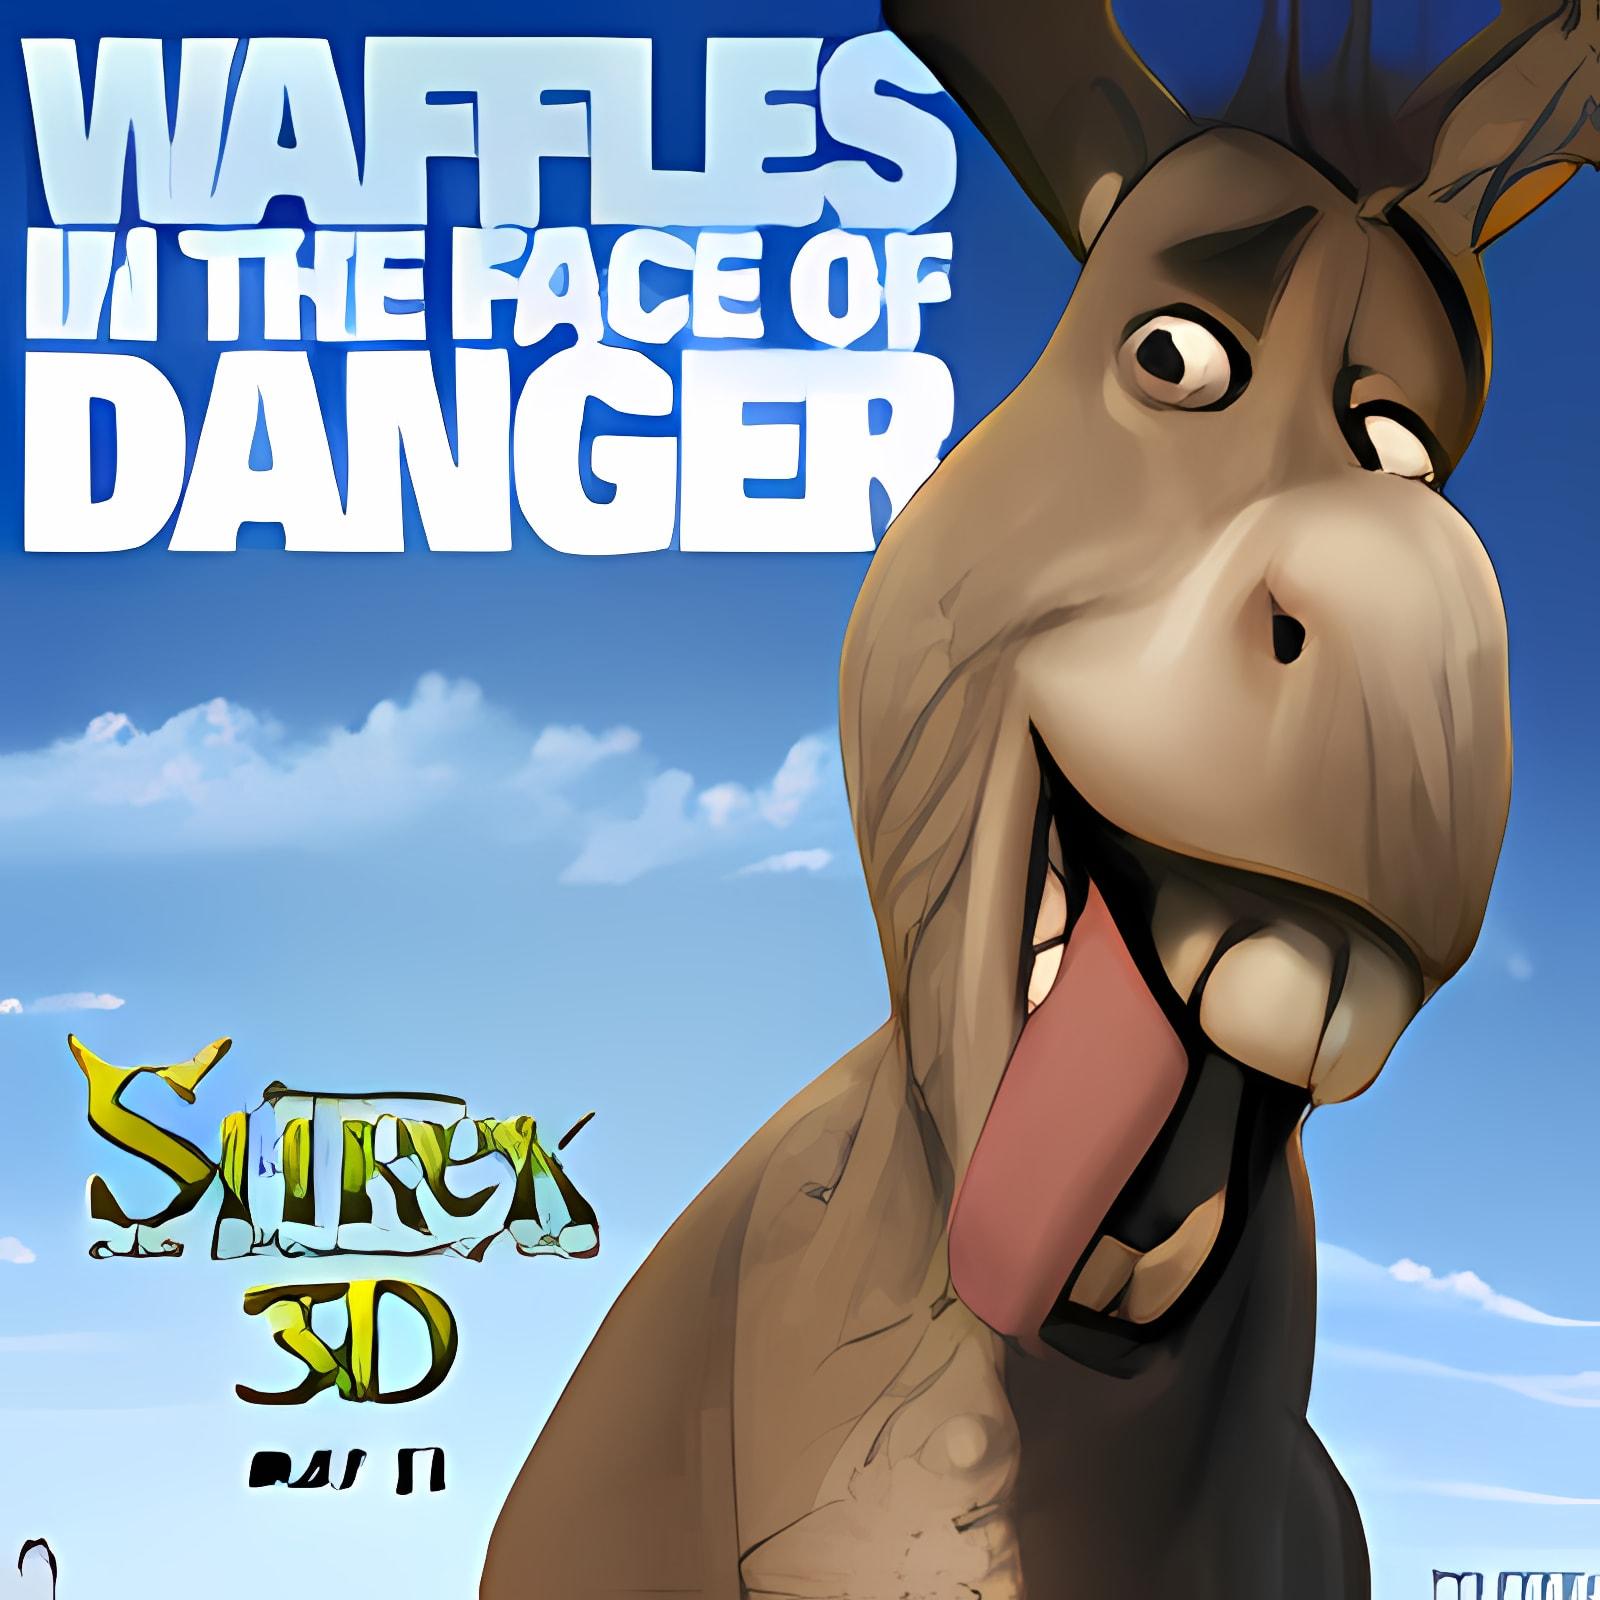 Shrek 4 Wallpaper: Donkey